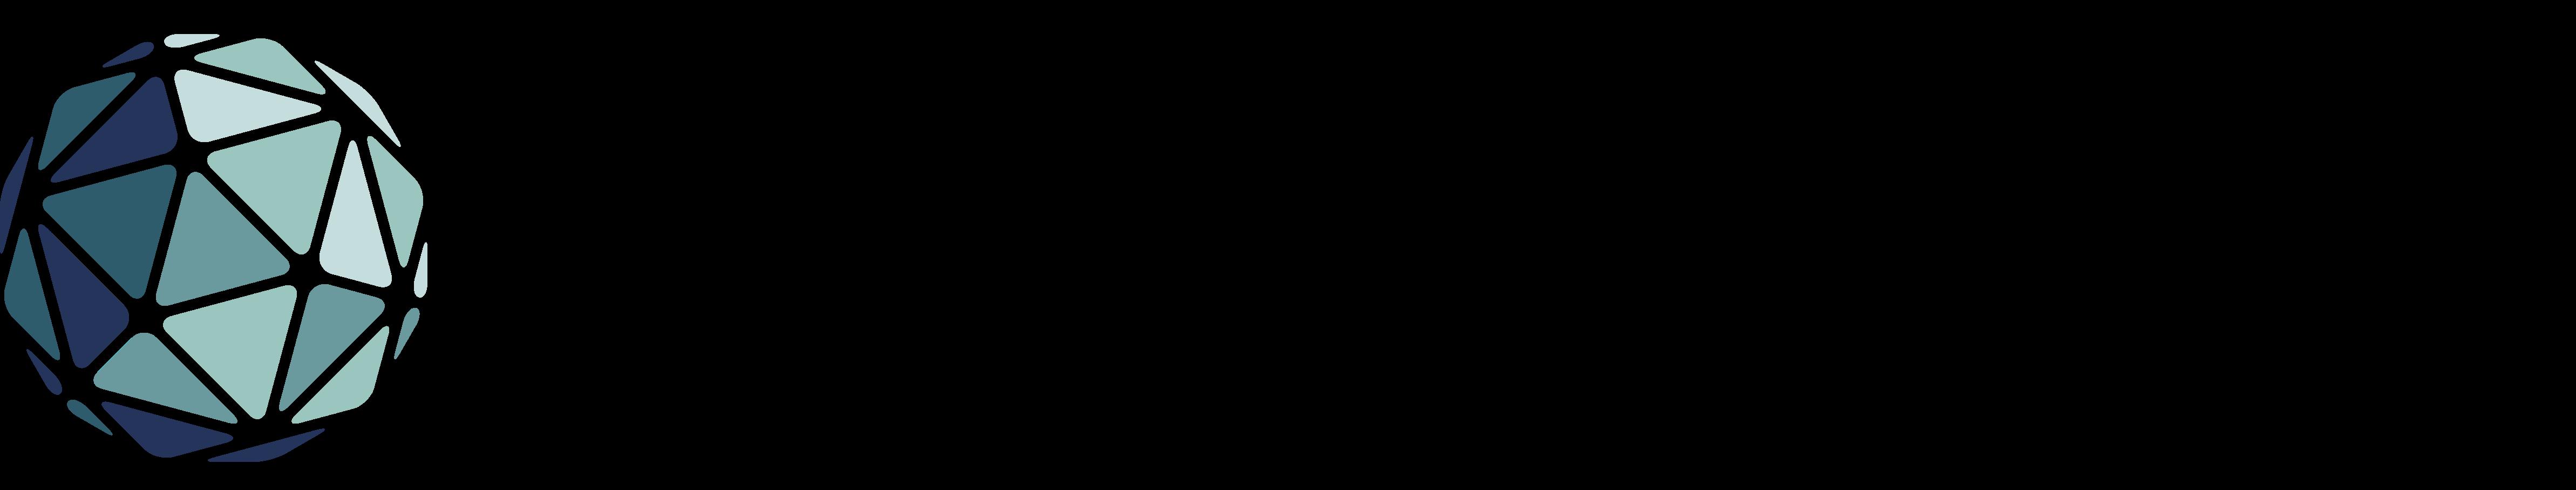 DiscoMTL large logo